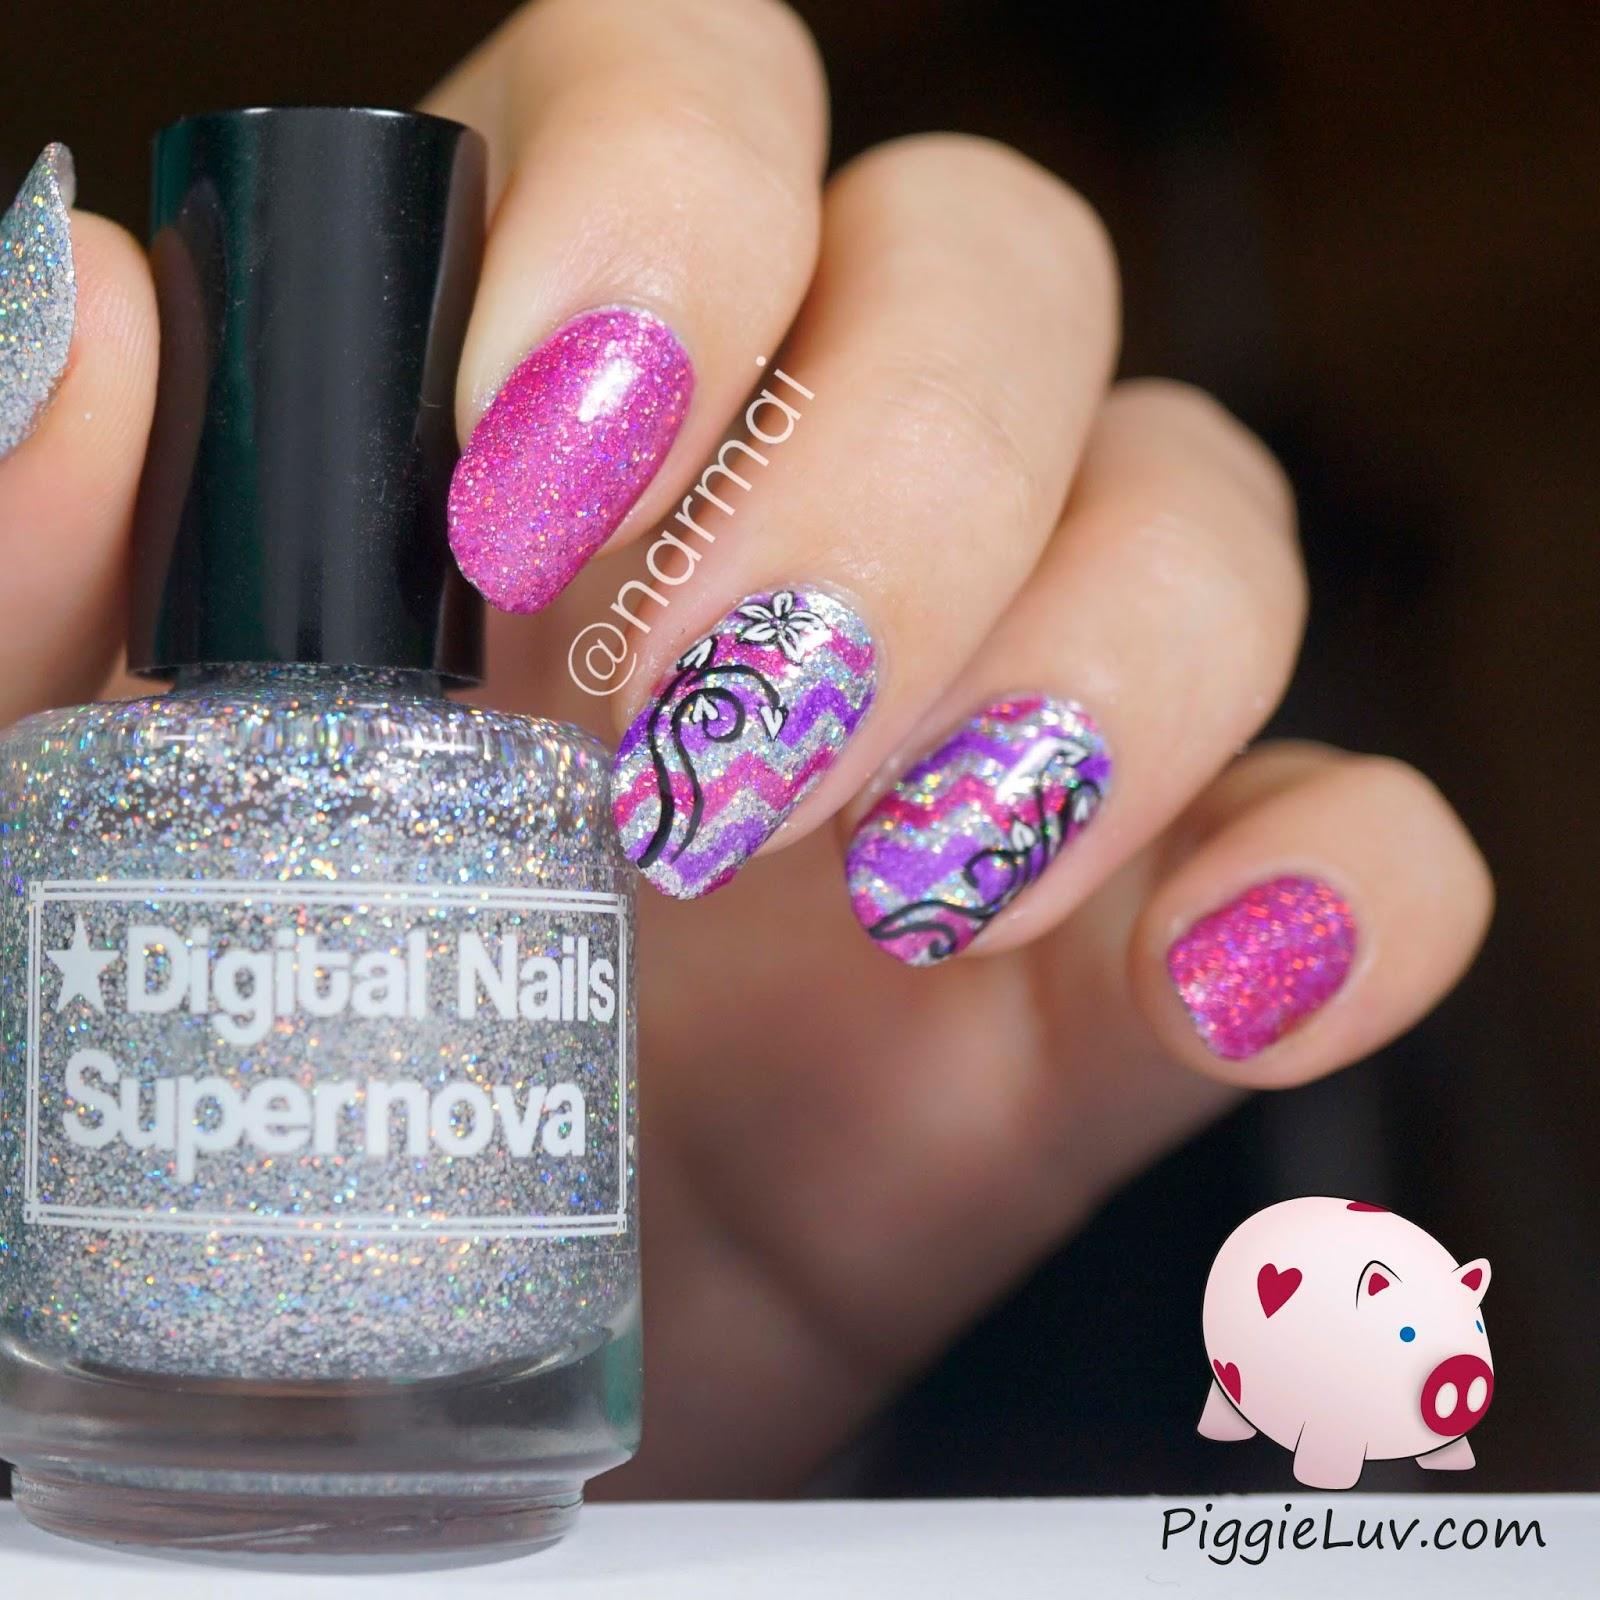 PiggieLuv: Sparkly chevrons & floral nail art